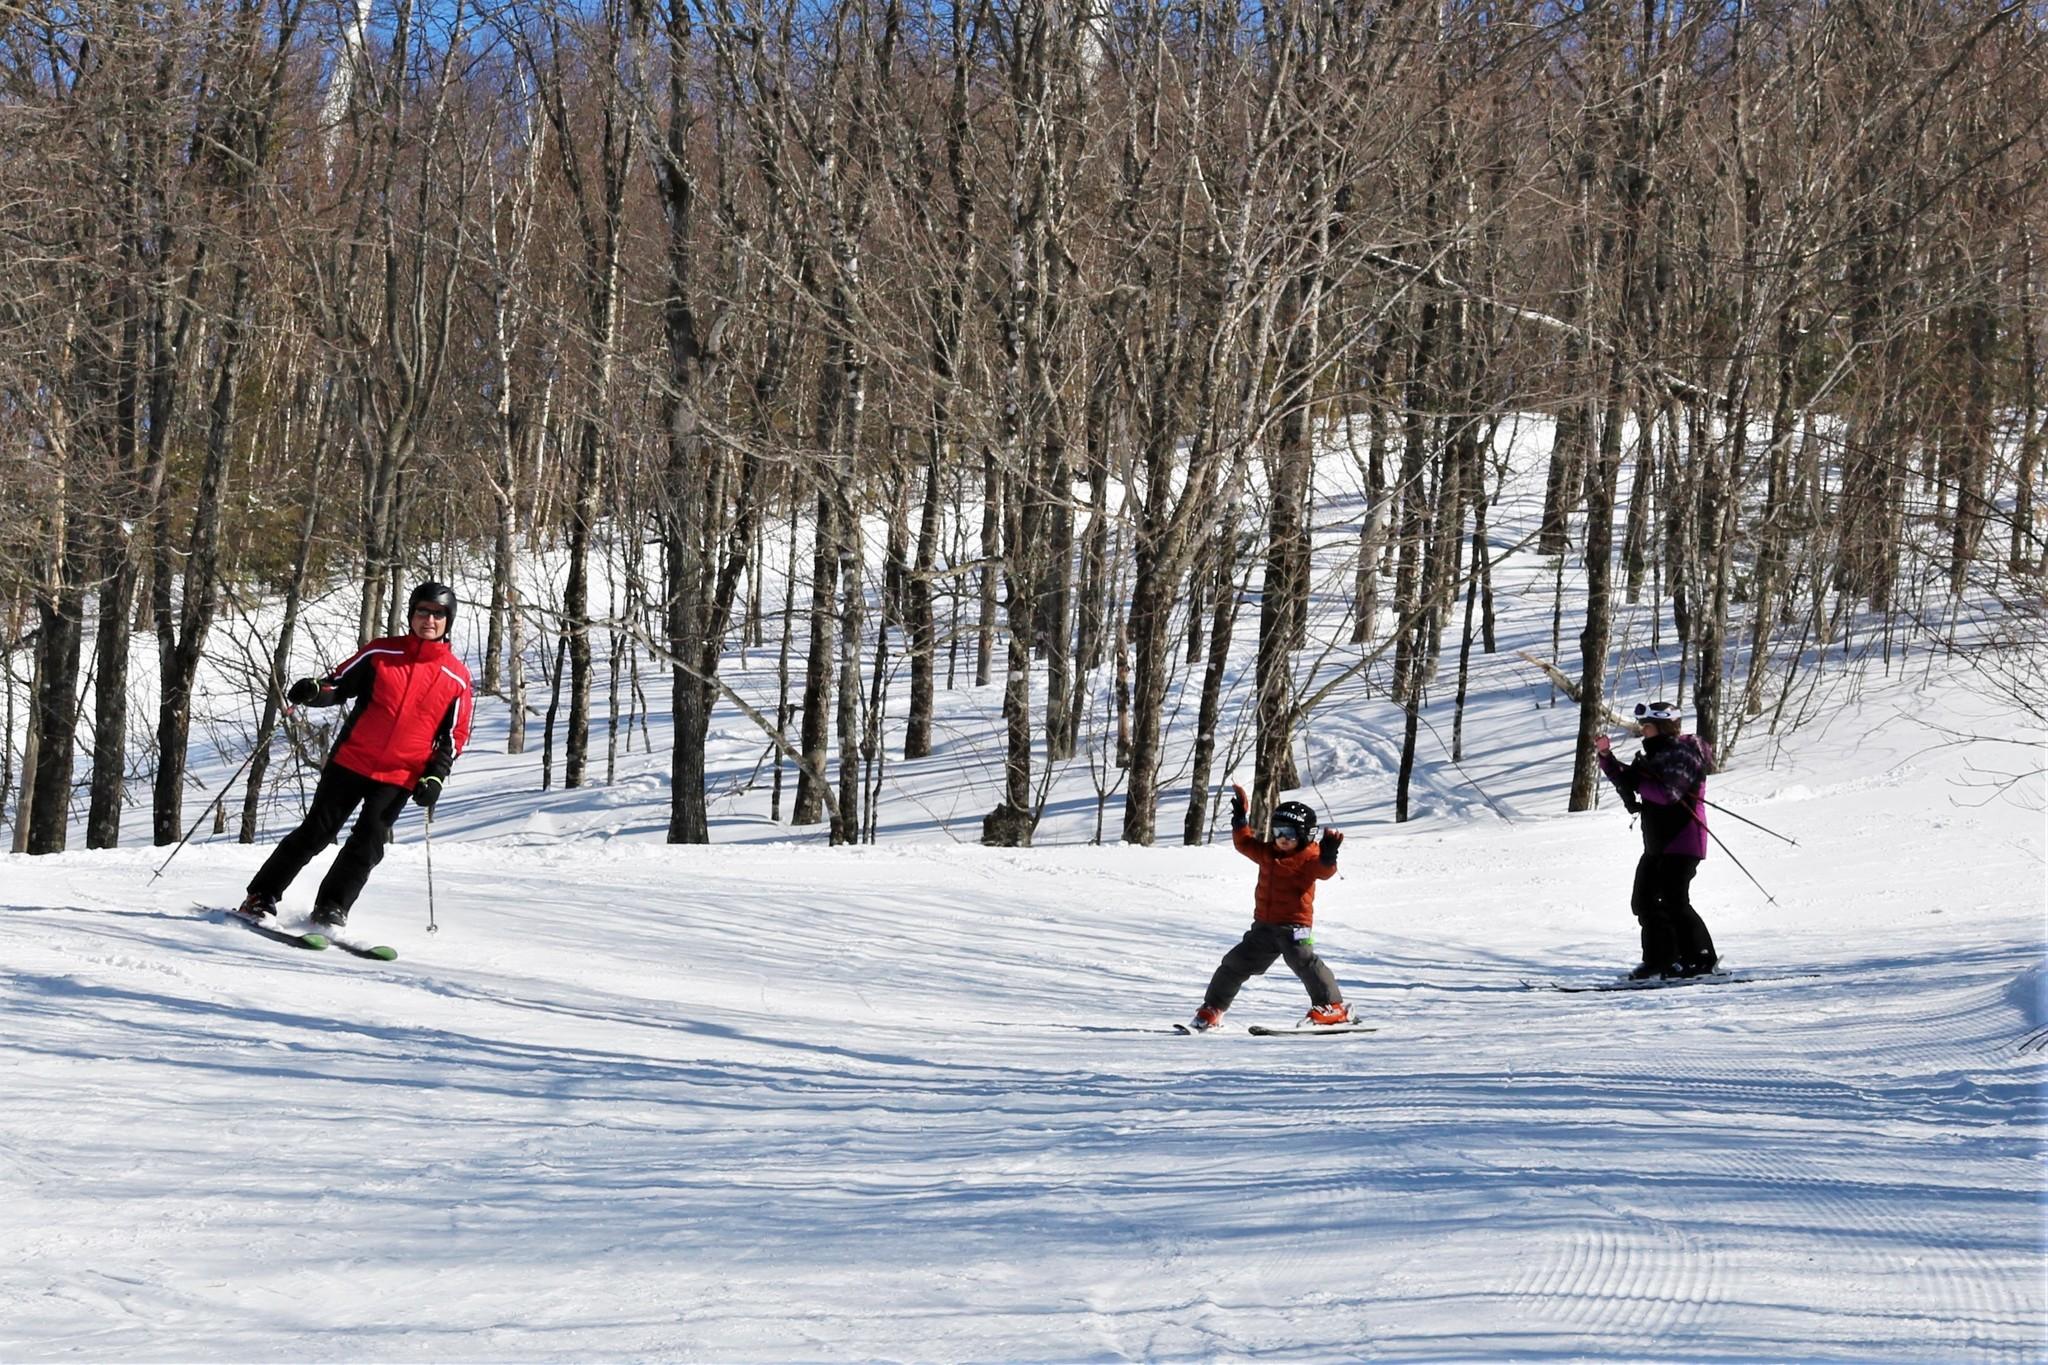 Adult Learn to Ski Program